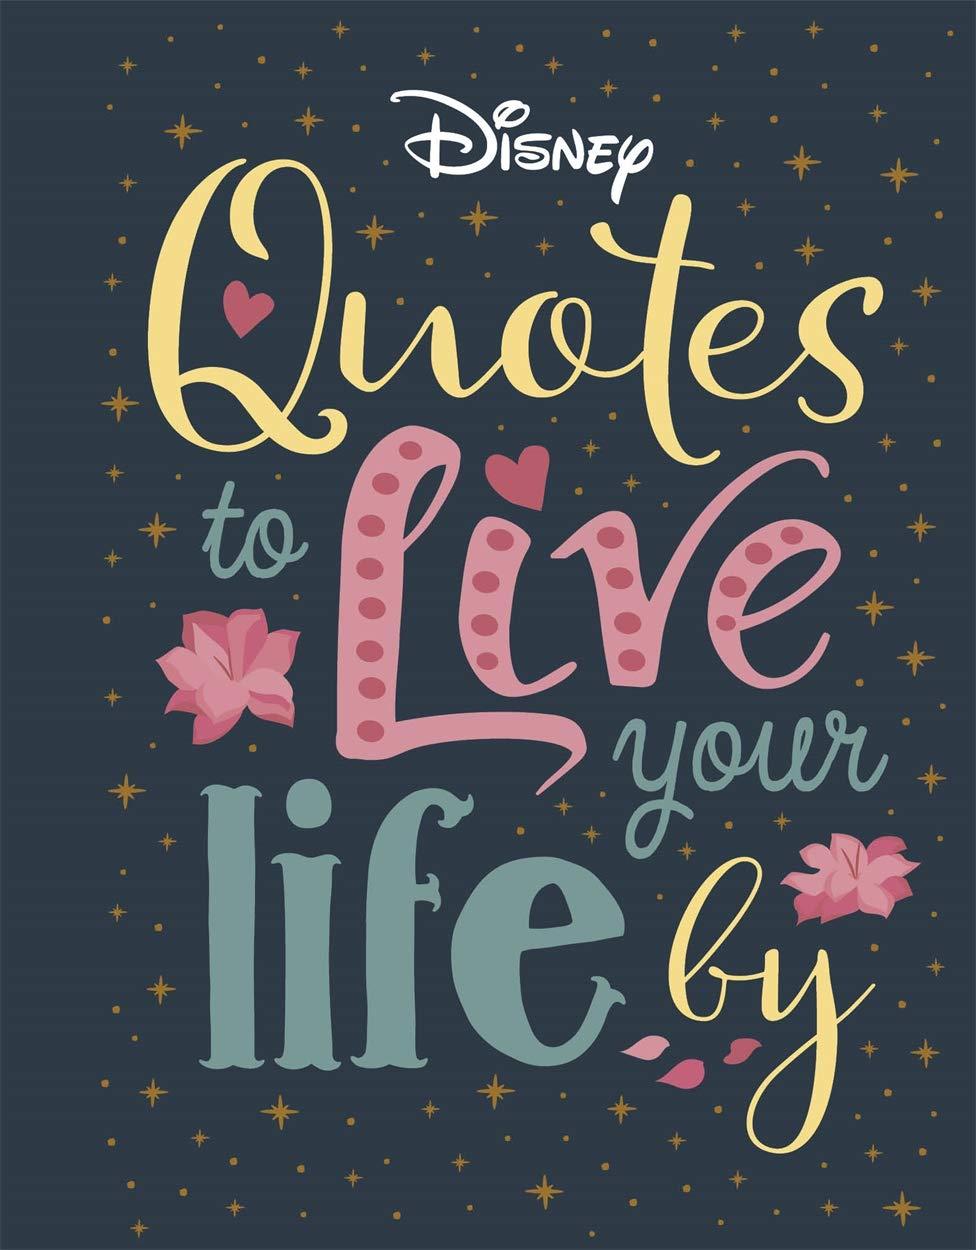 Disney Quotes to Live Your Life By: Amazon.co.uk: Walt Disney